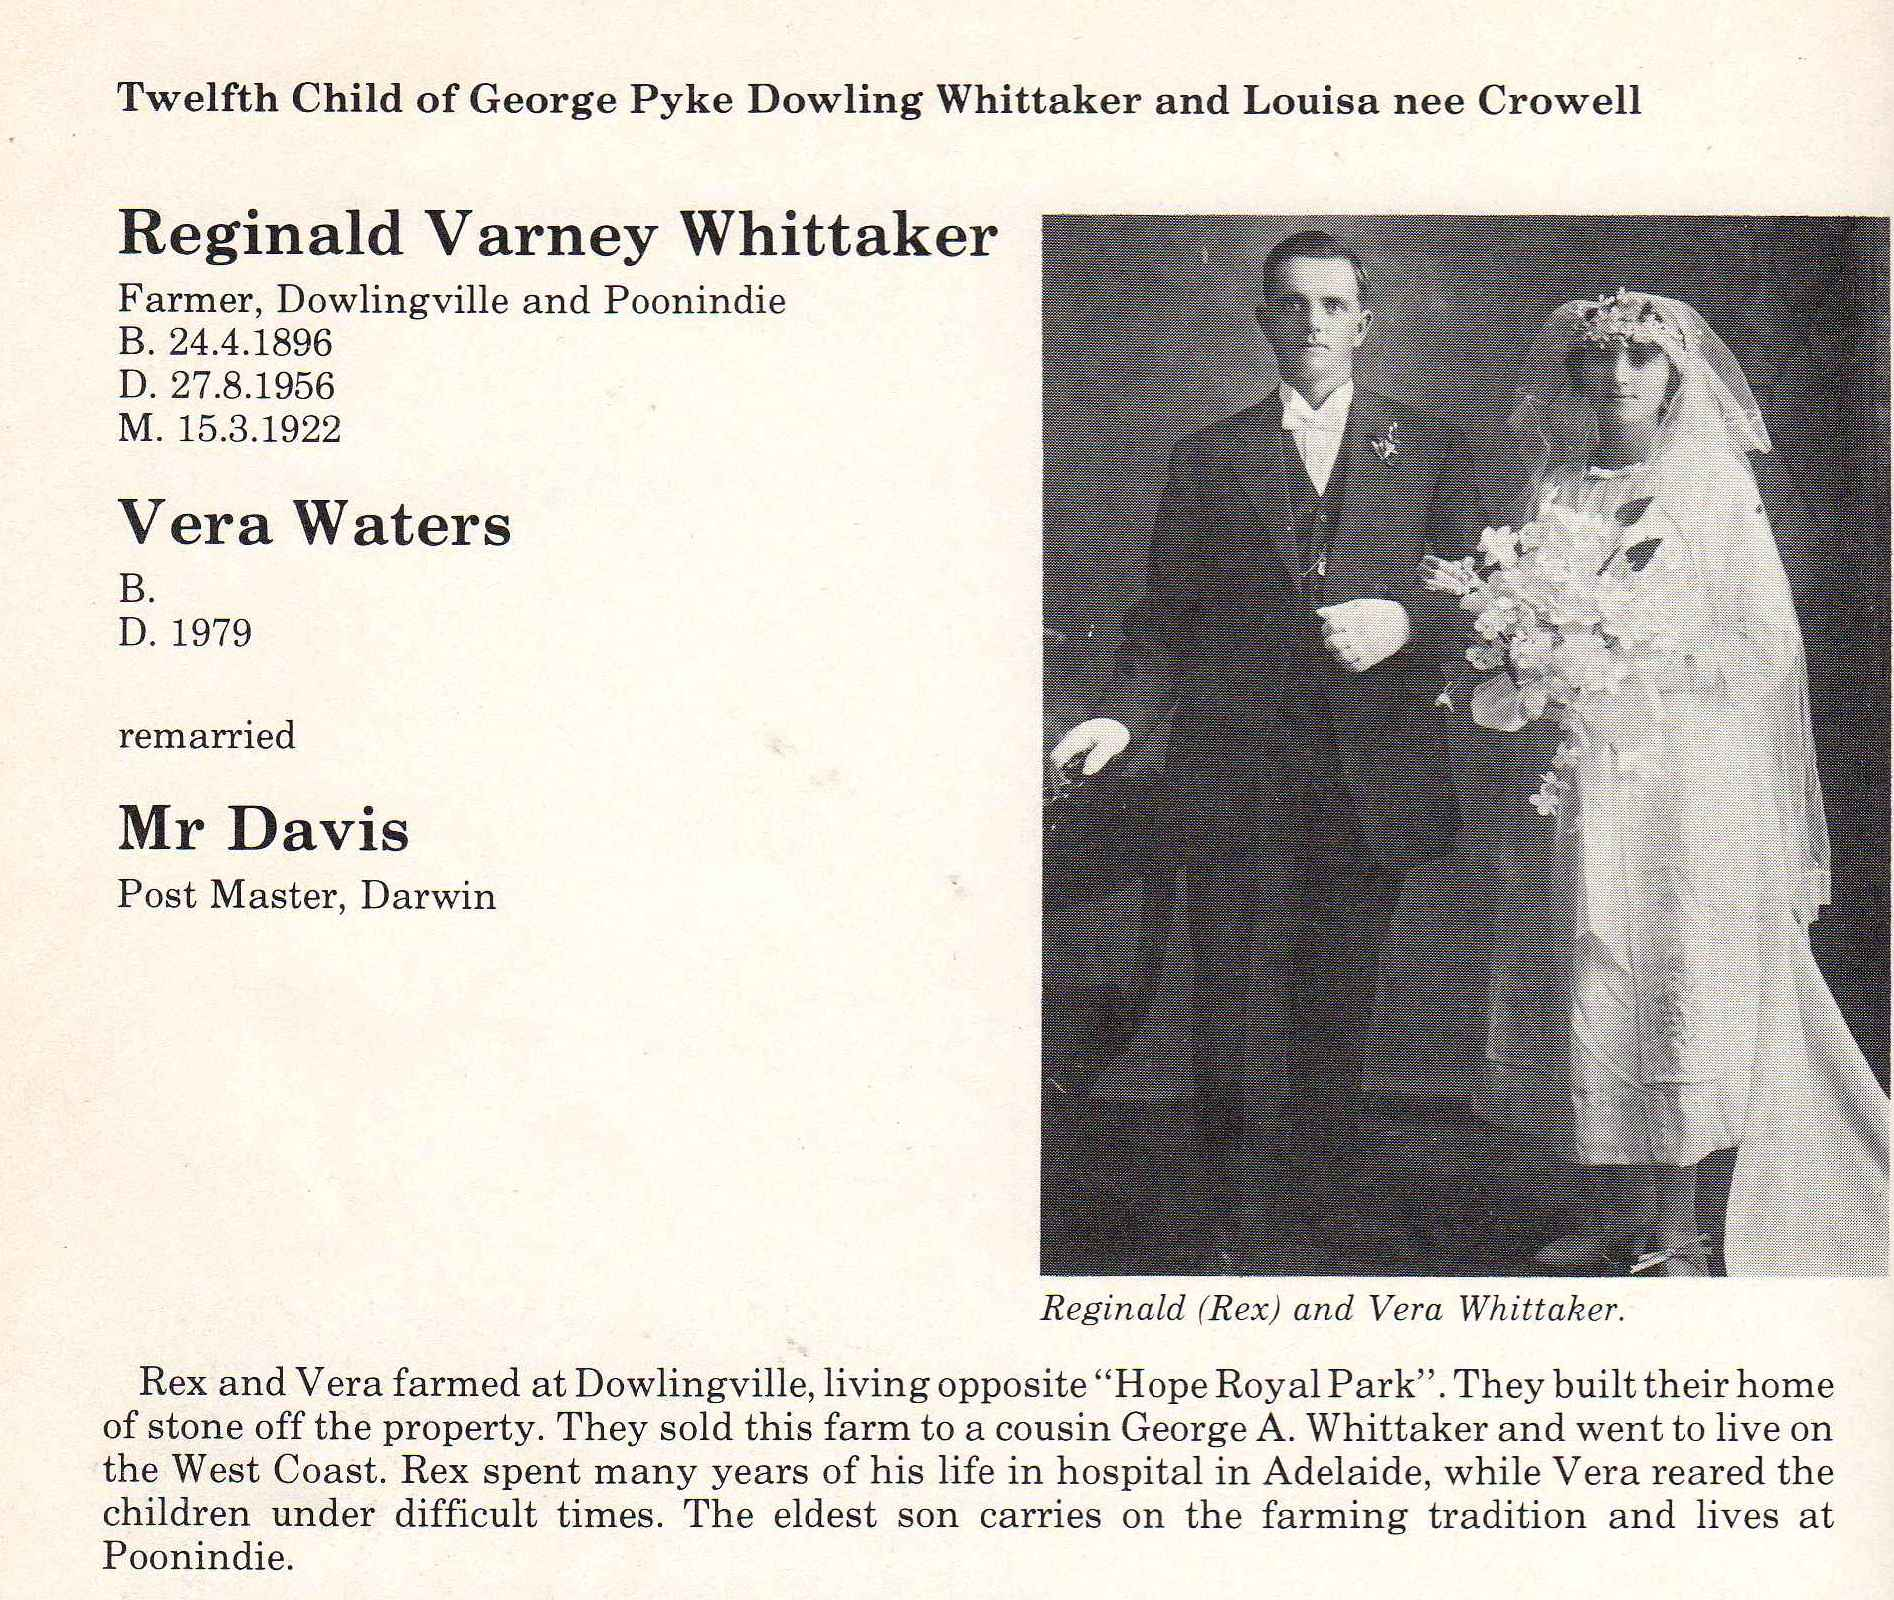 Vera Waters